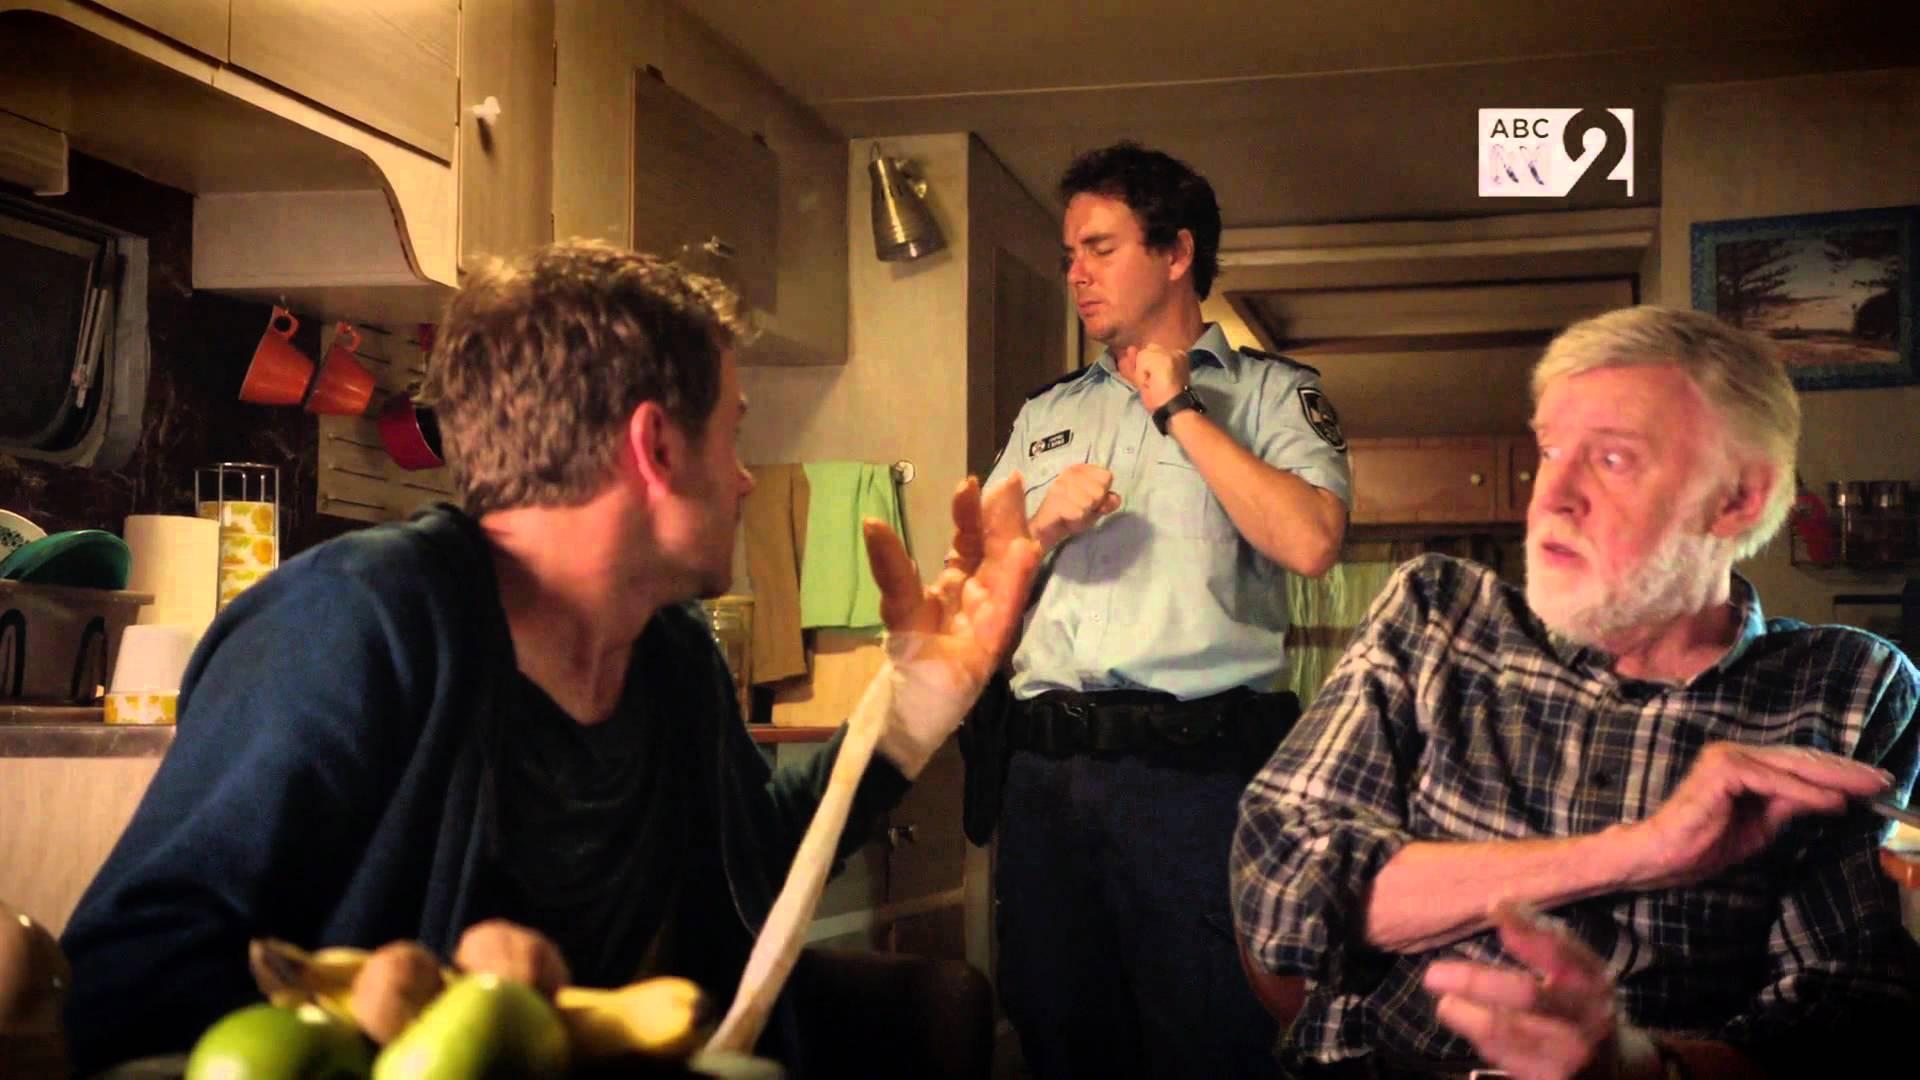 Promo | The Strange Calls |  Coming Soon to ABC2